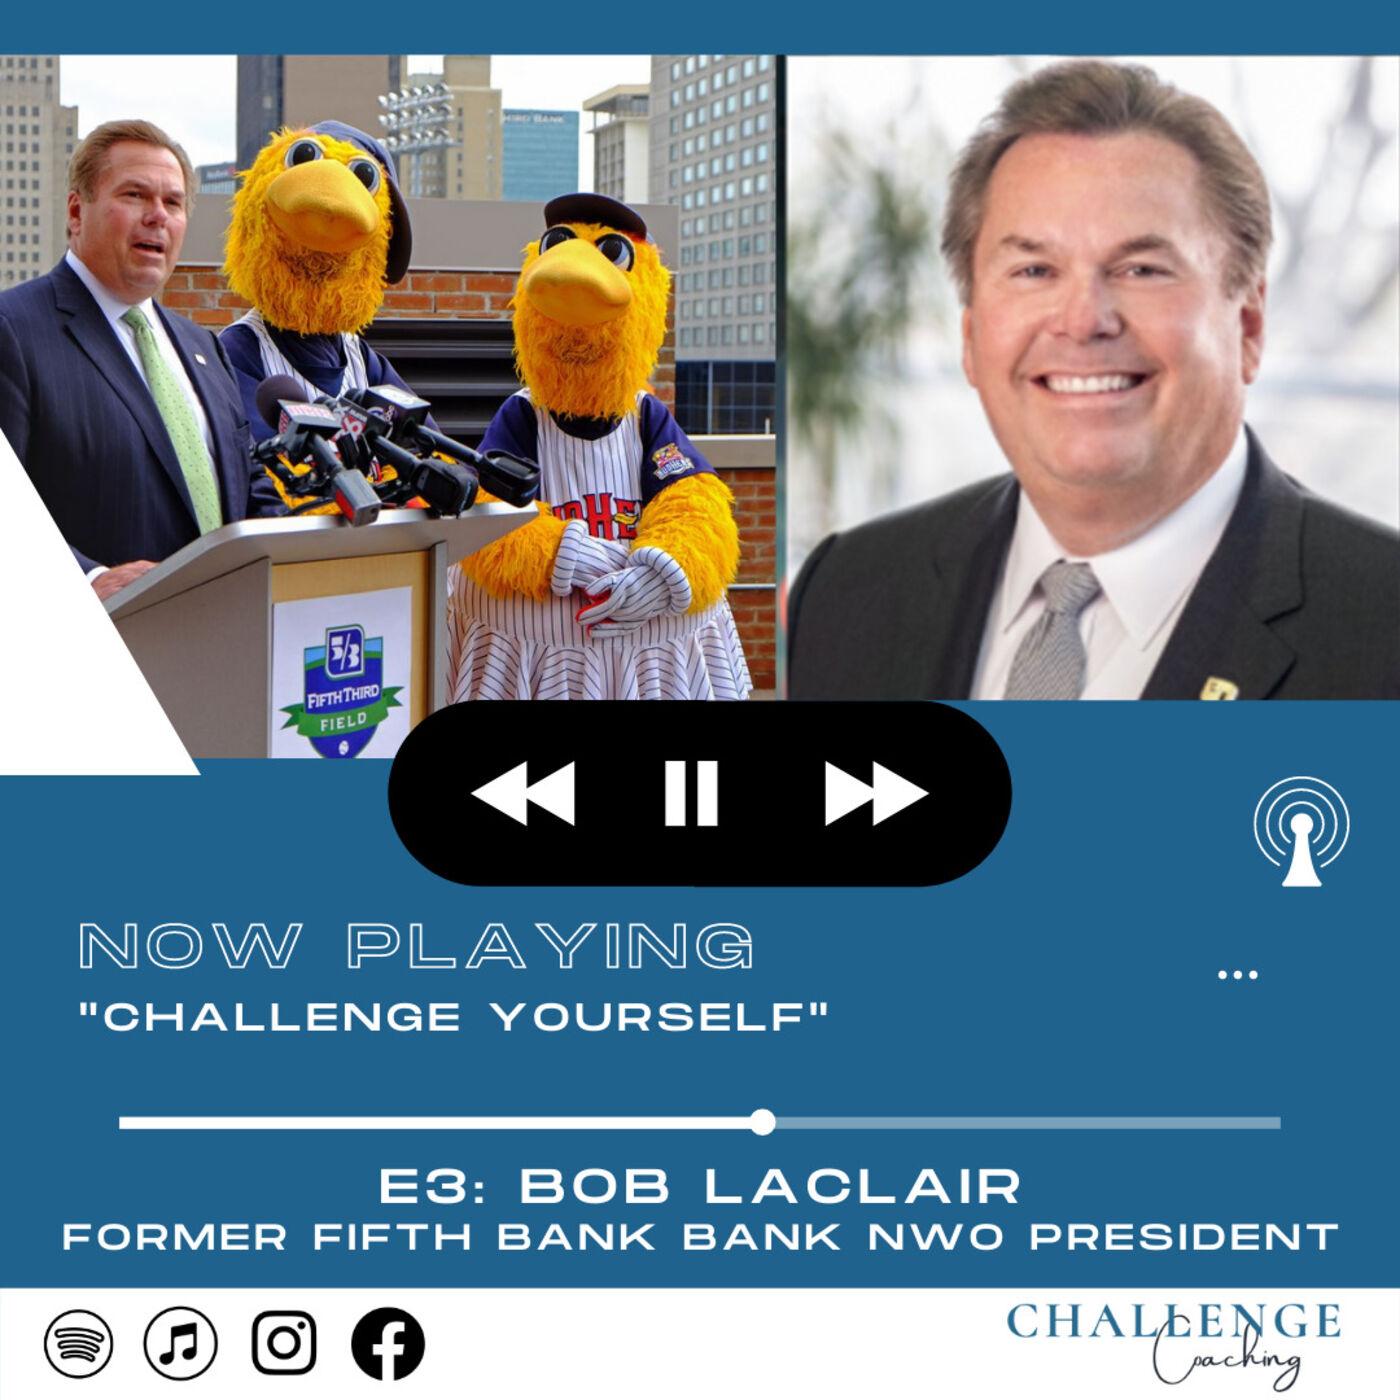 E3: Bob LaClair: Former President of Fifth Third Bank NWO